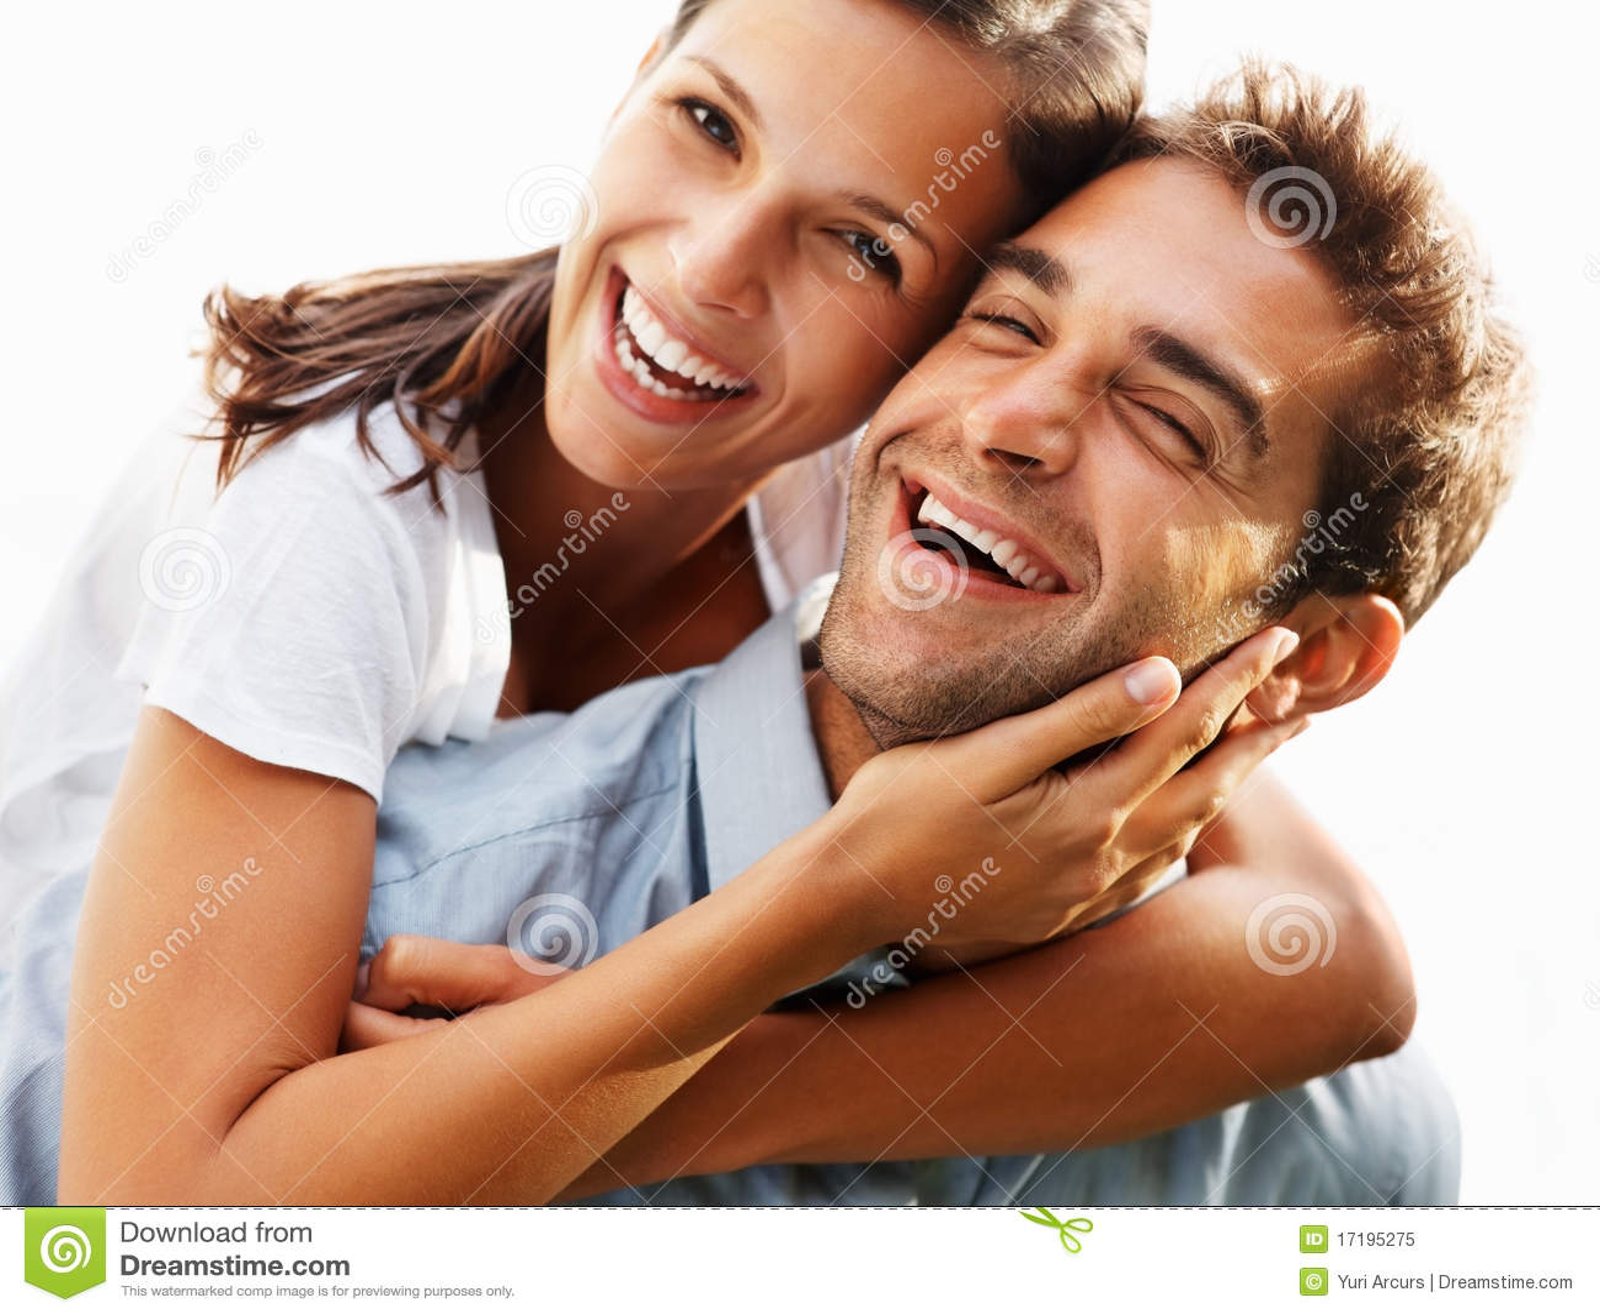 Fun-loving Couple Enjoying Life Stock Image